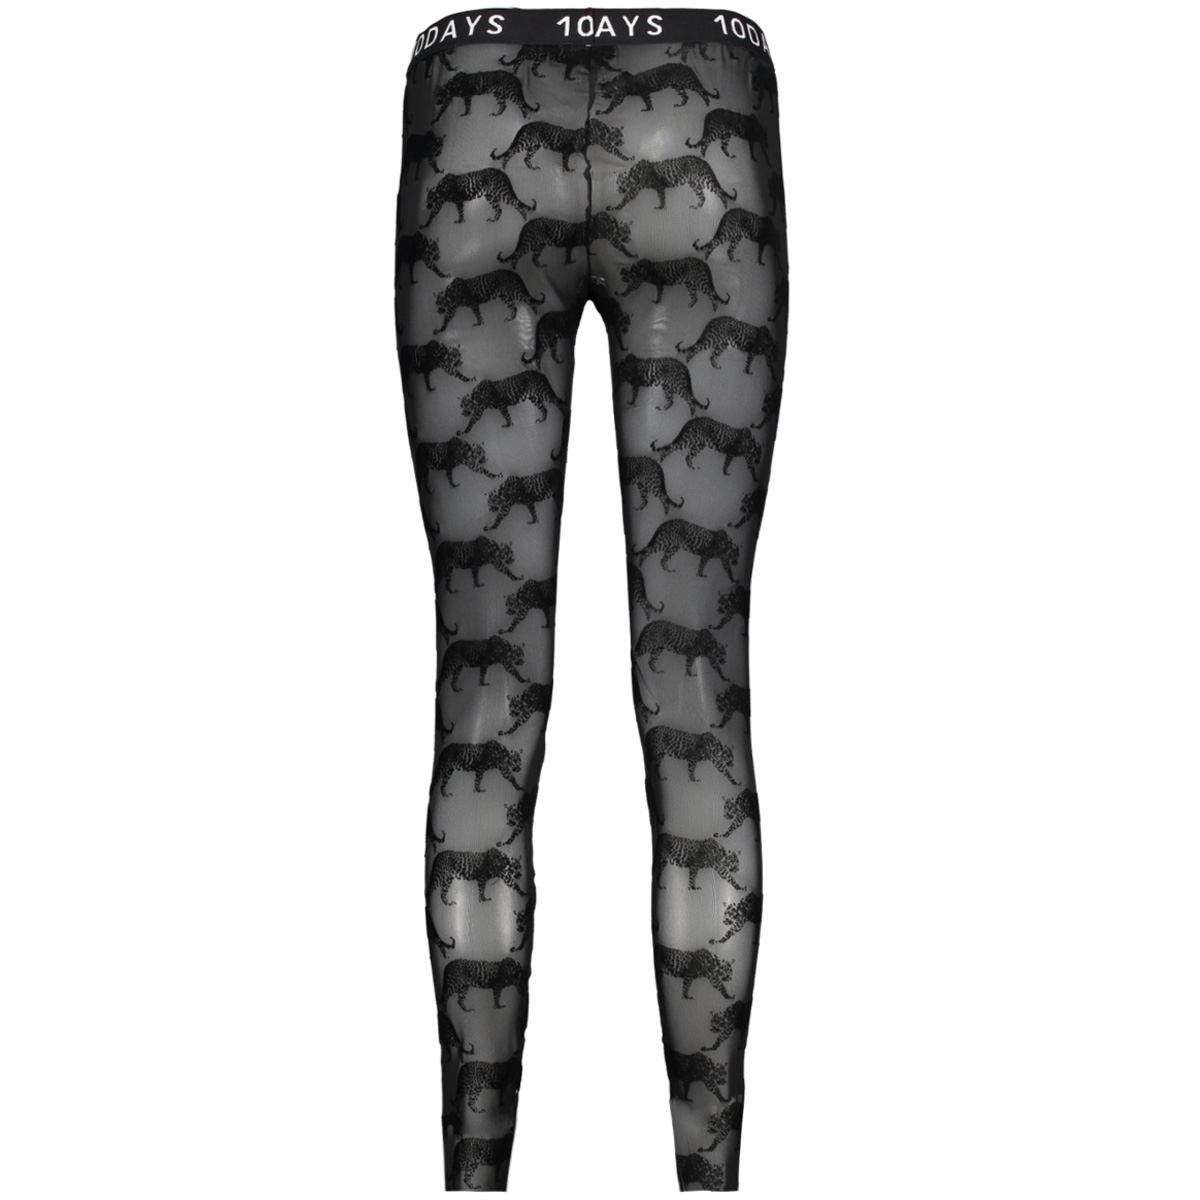 20-035-7103 10 days legging black